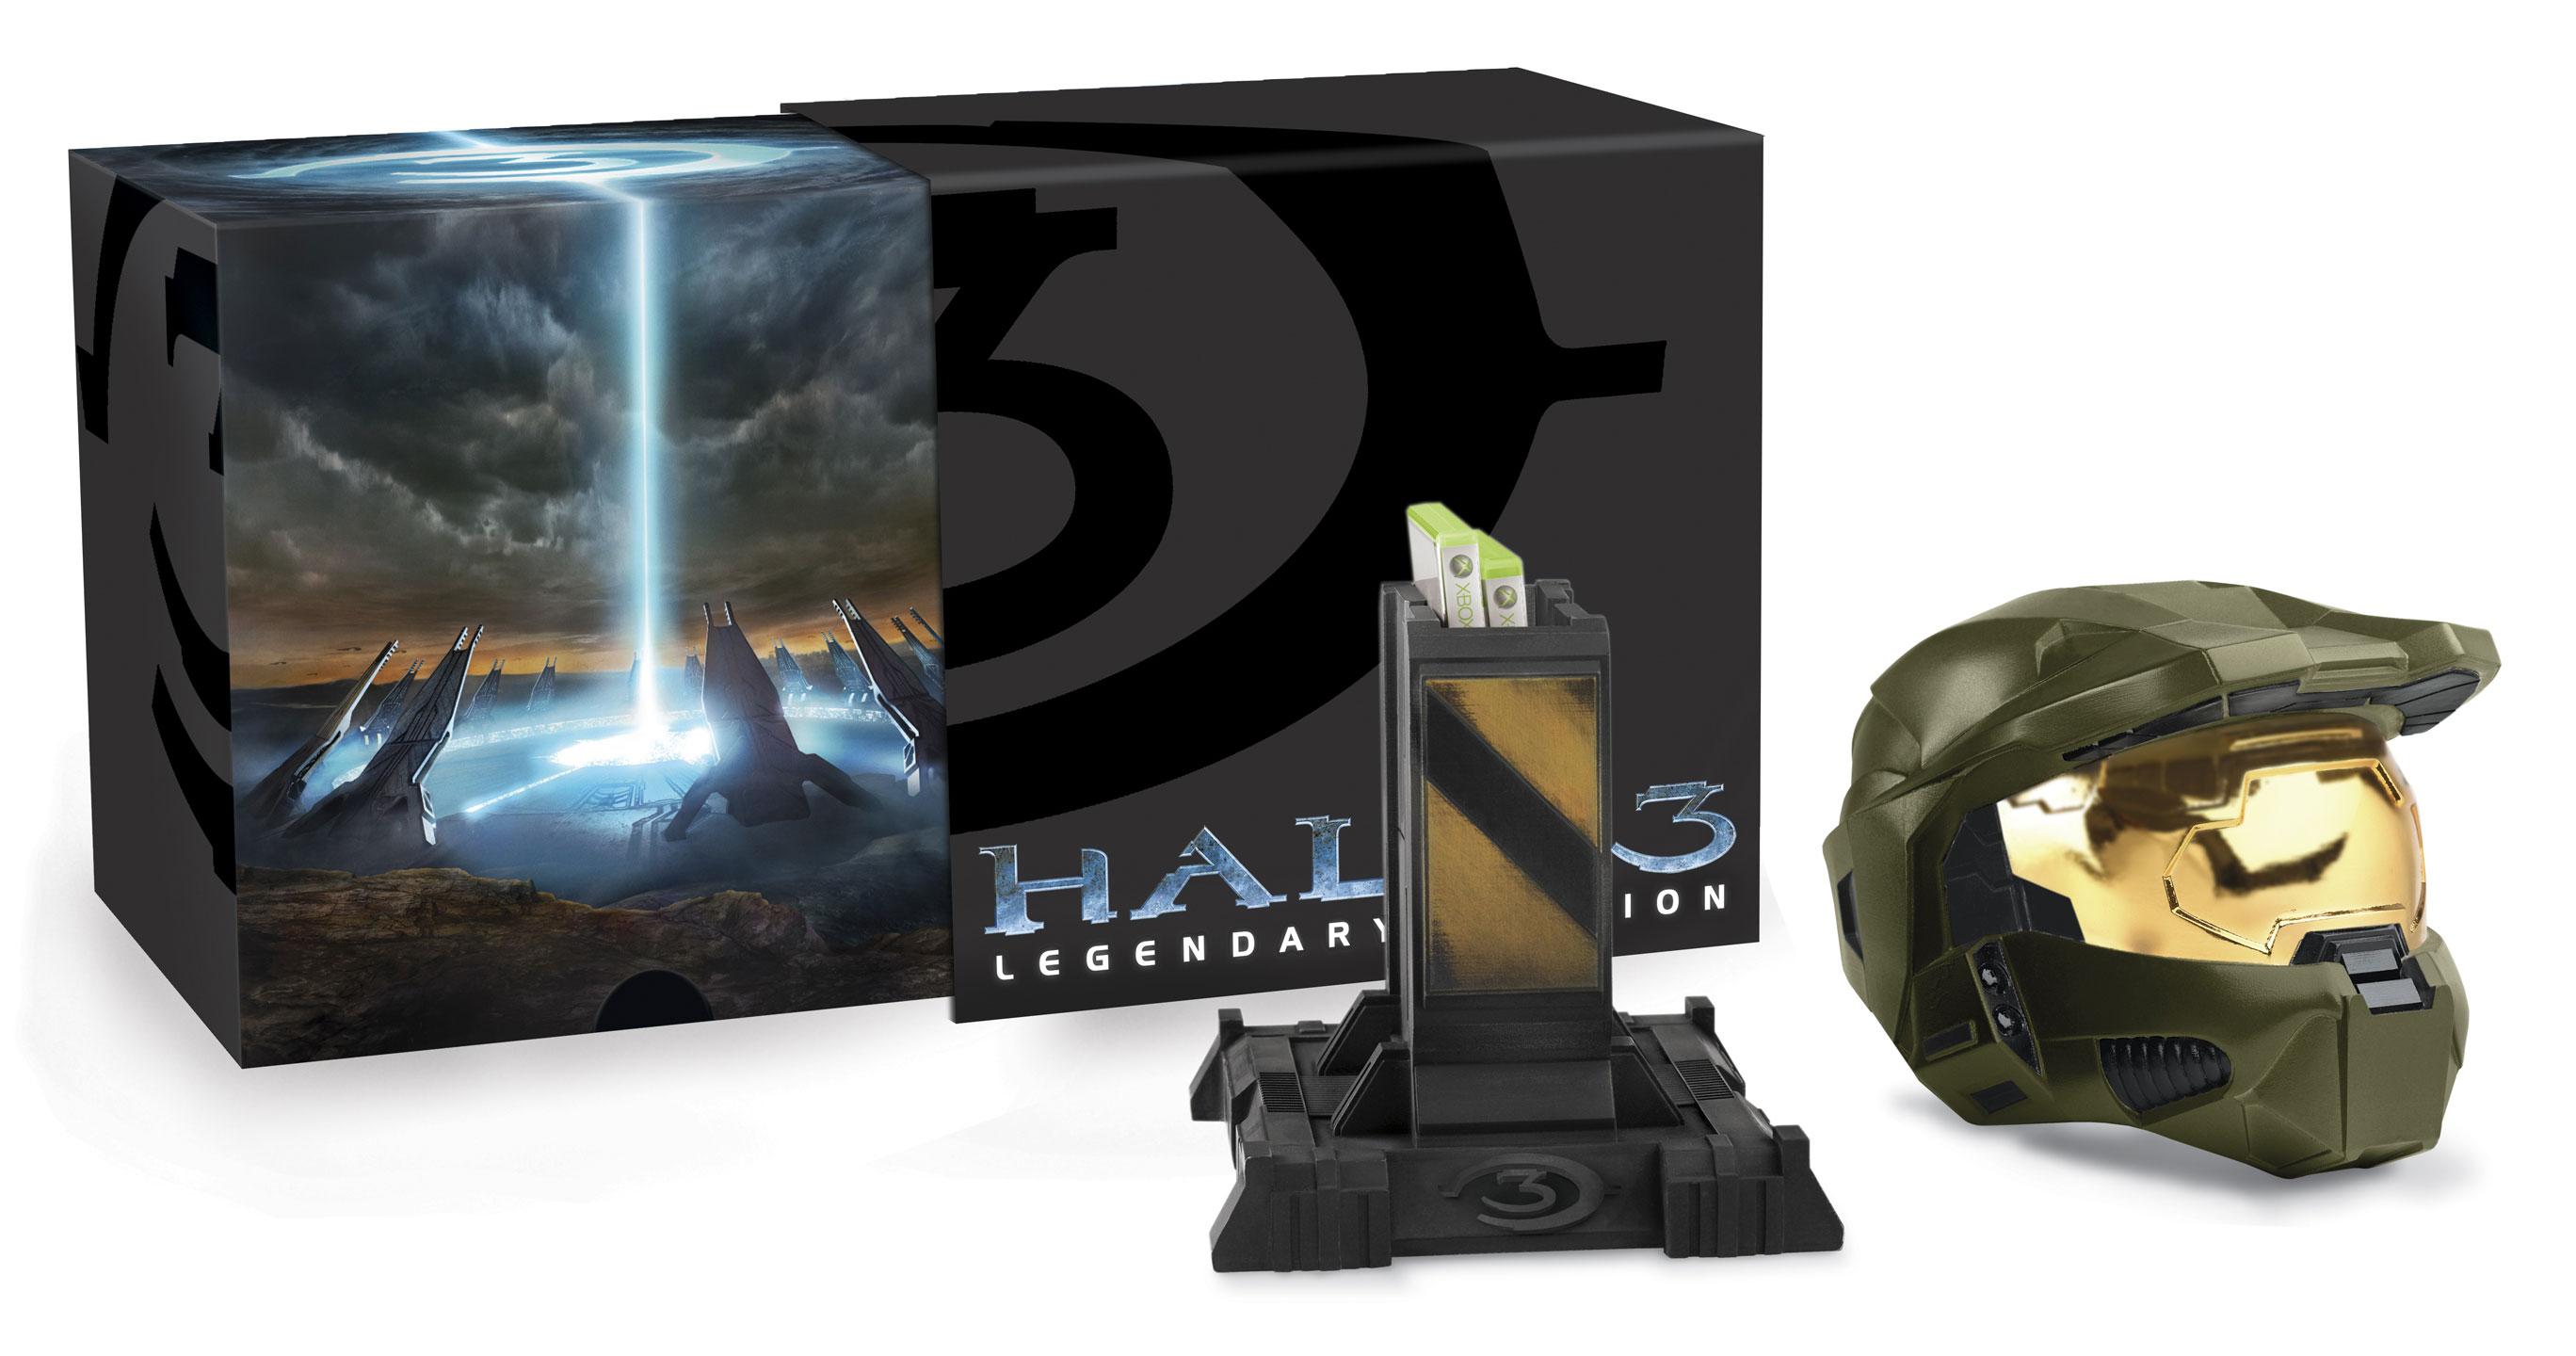 Iob halo 3 legendary edition helmet (no game) shopgoodwill. Com.